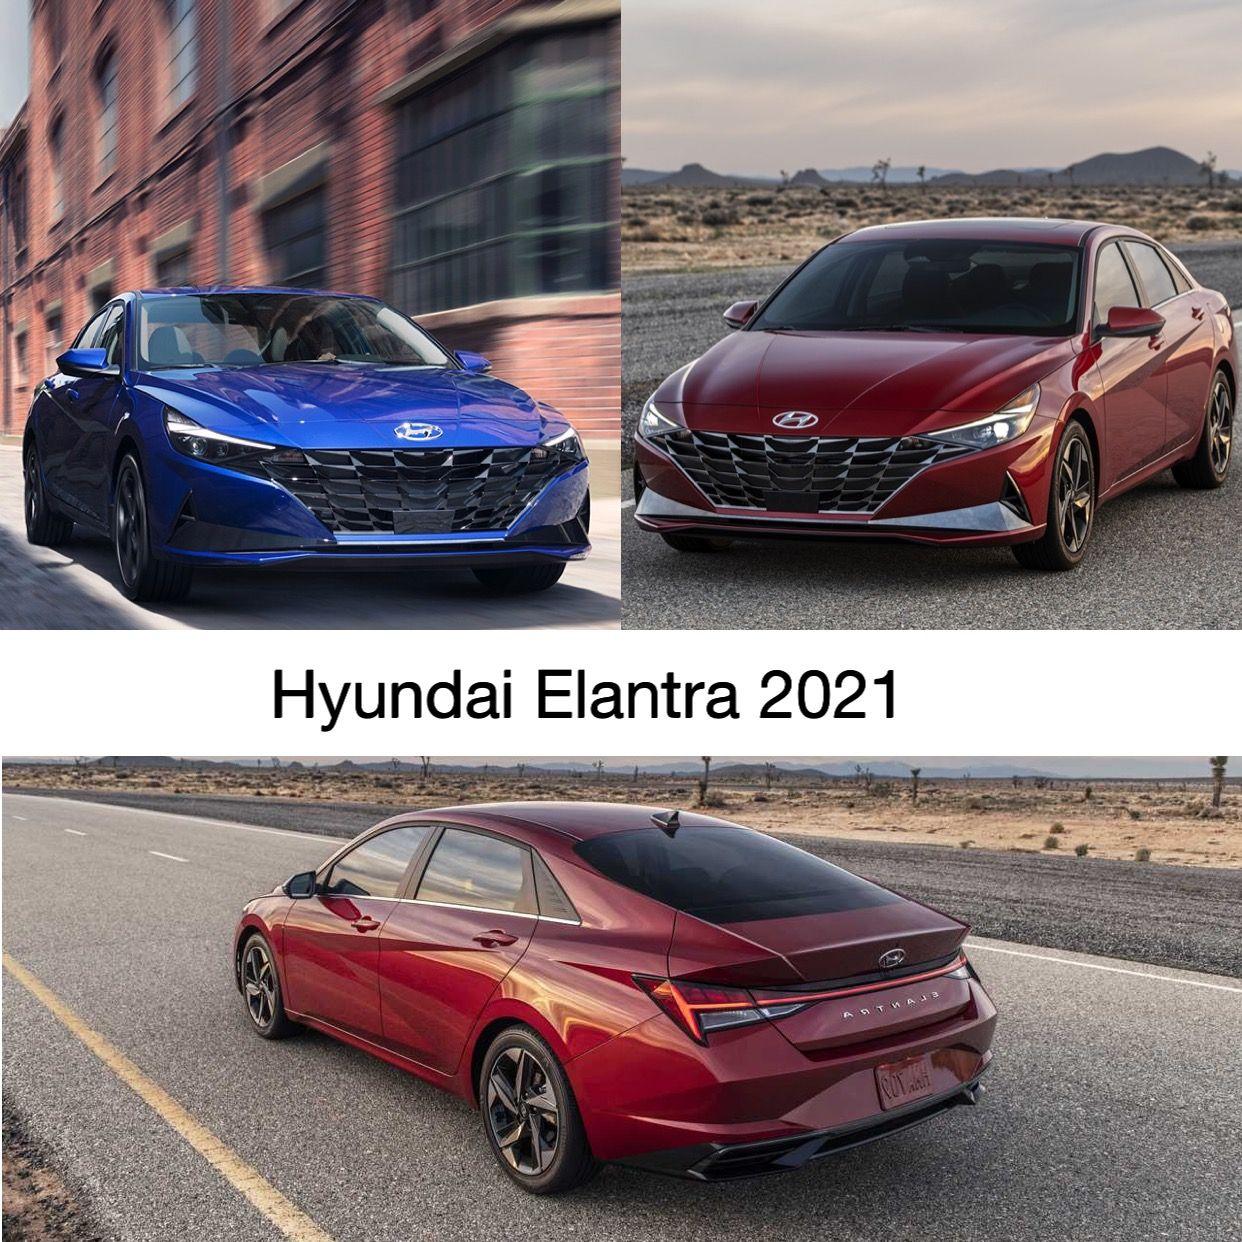 Hyundai Elantra 2021 In 2020 Hyundai Hyundai Elantra Elantra